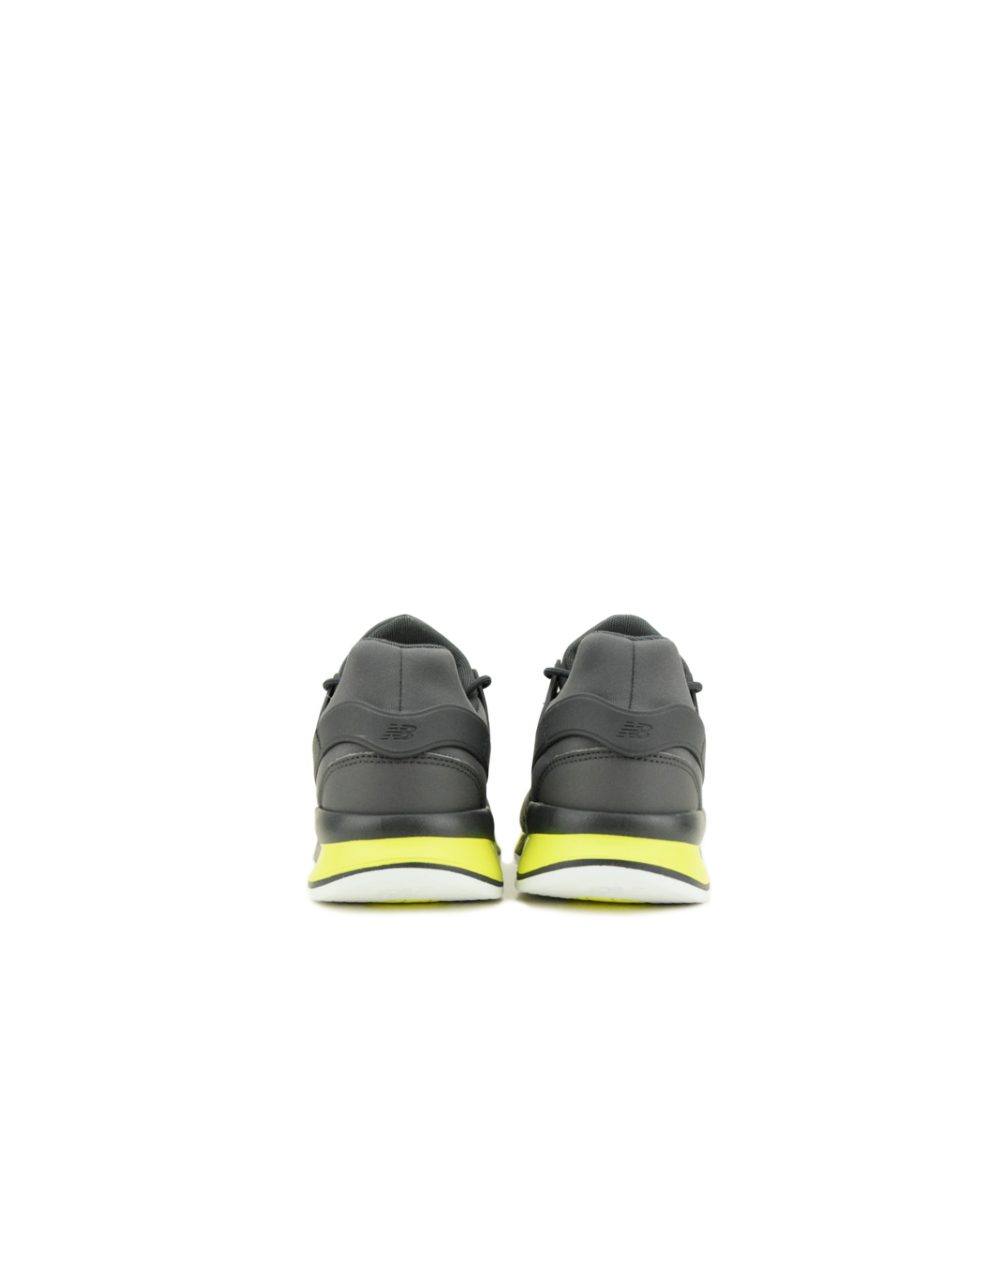 New Balance MS247TG Grey